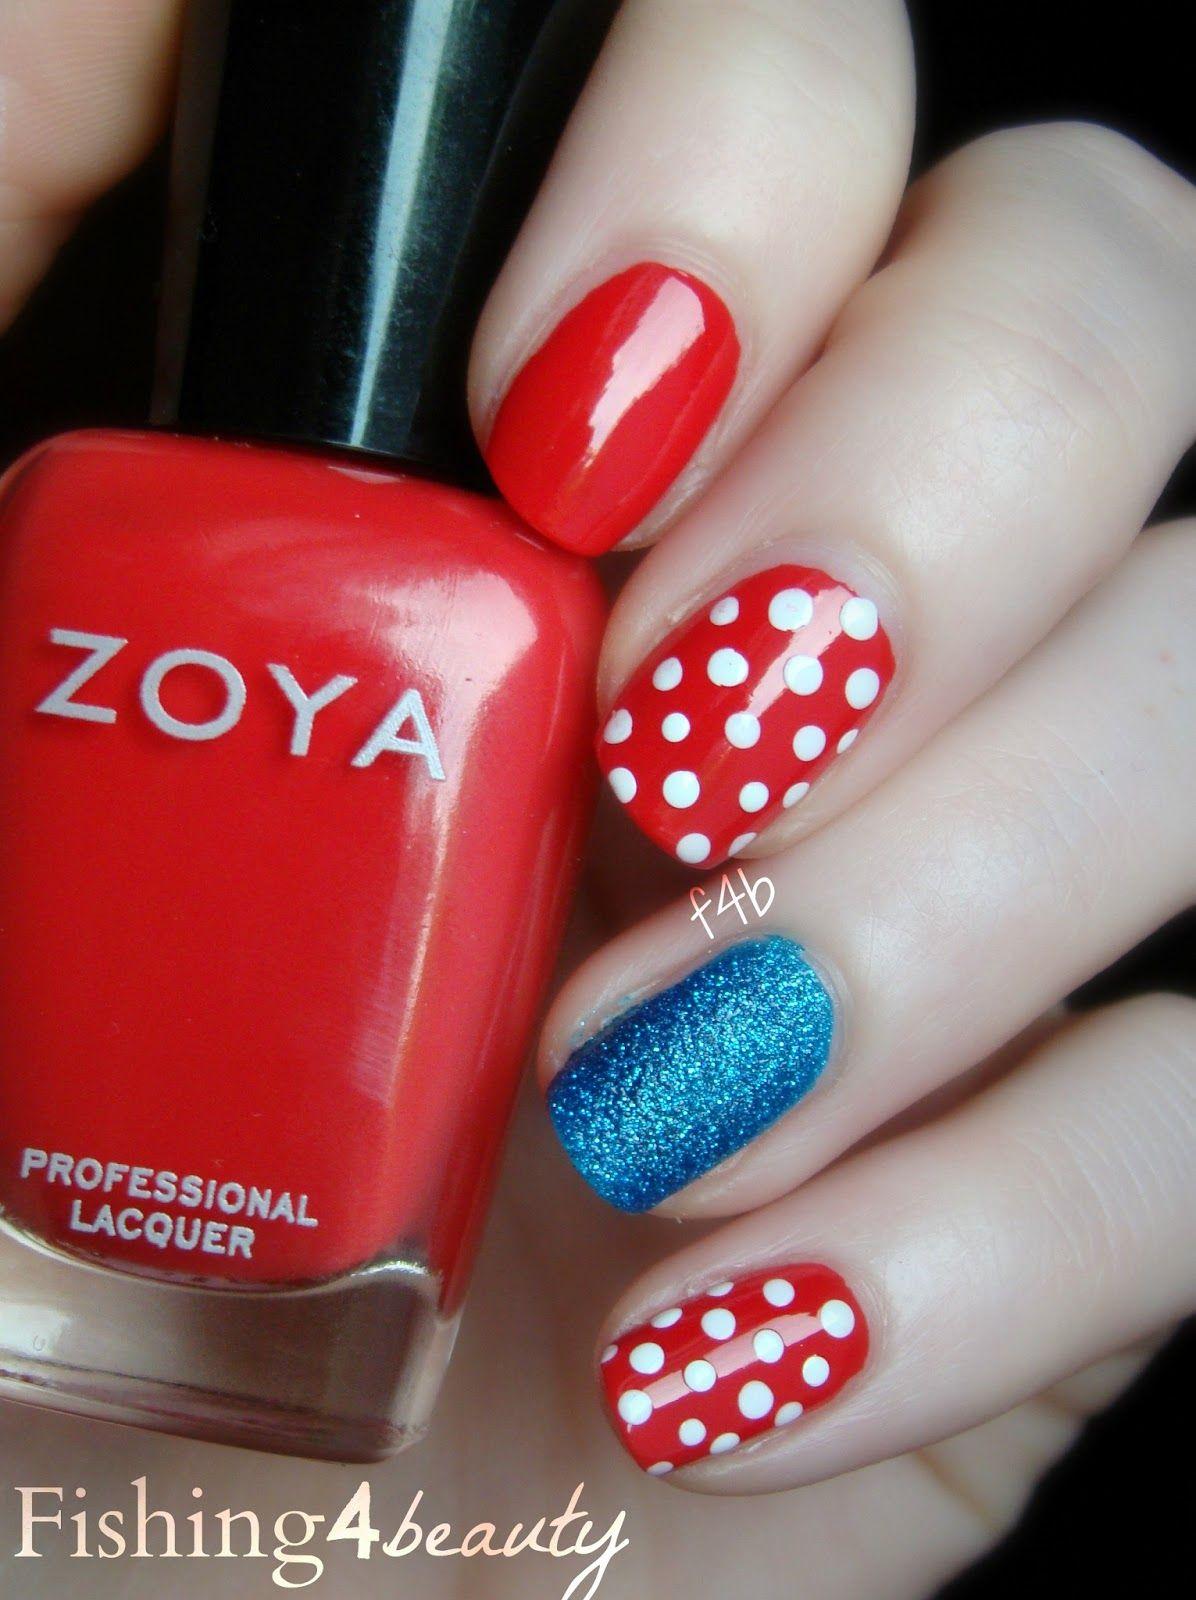 Fishing4beauty Thank You A Patriotic Manicure Using Zoya